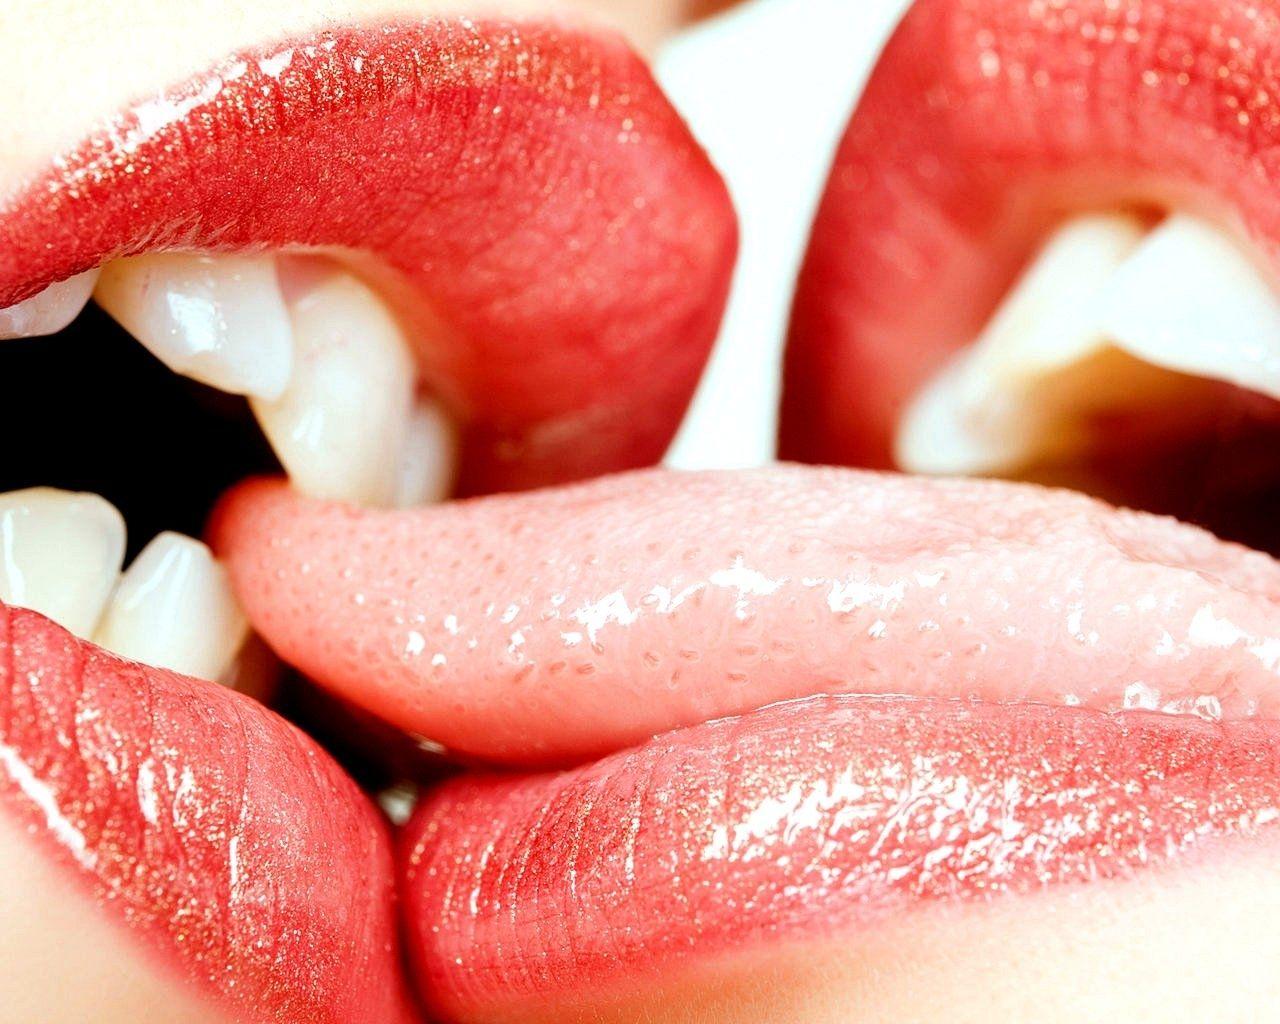 tongue wrestling